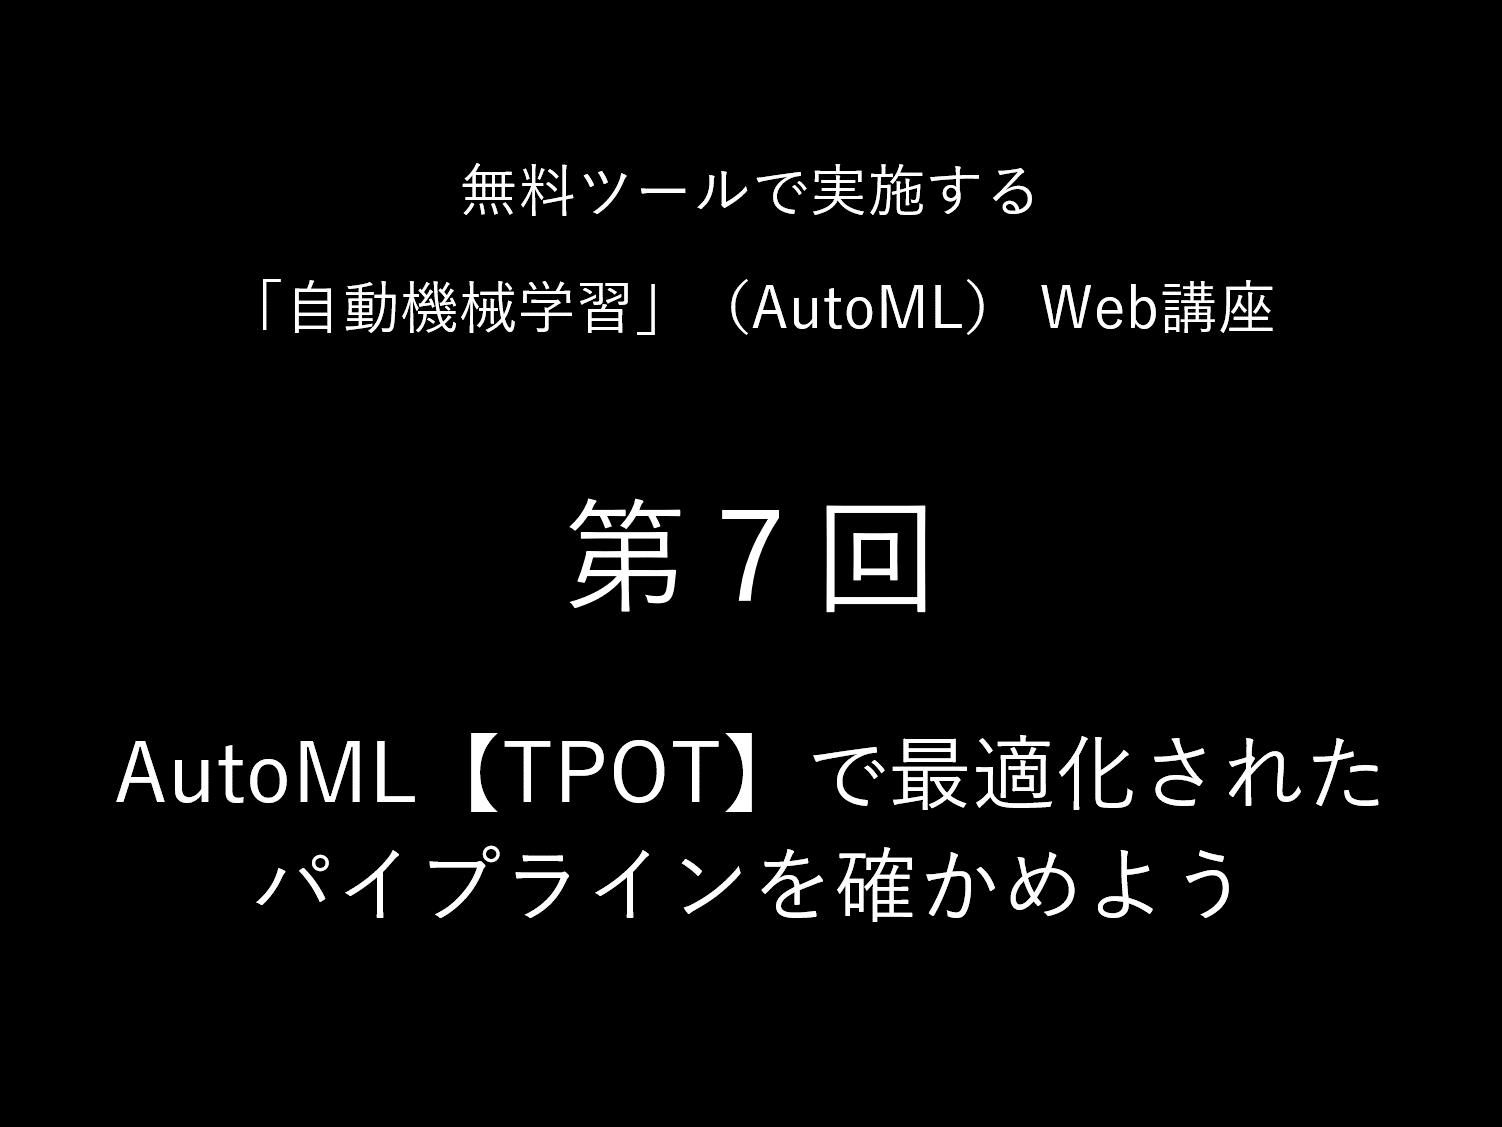 AutoML【TPOT】で最適化された「パイプライン」(変換器・予測器)を確かめよう